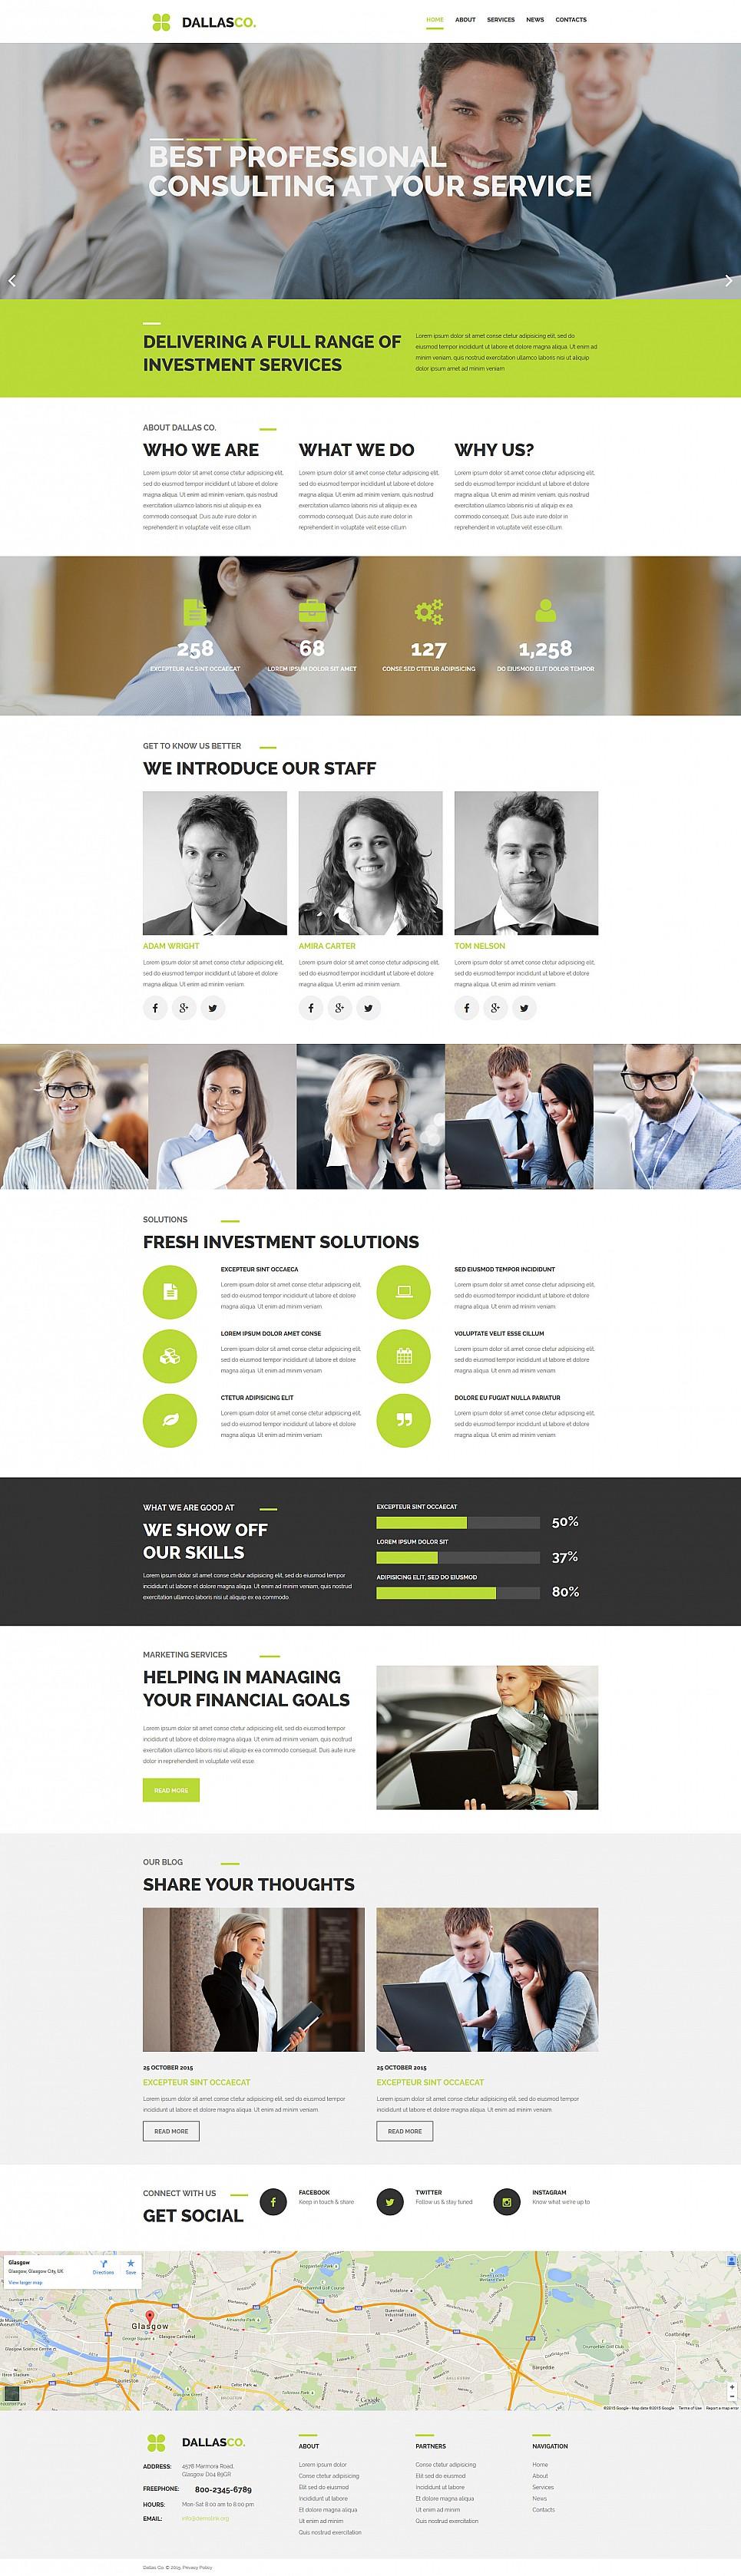 Professional Website Design for Business - image